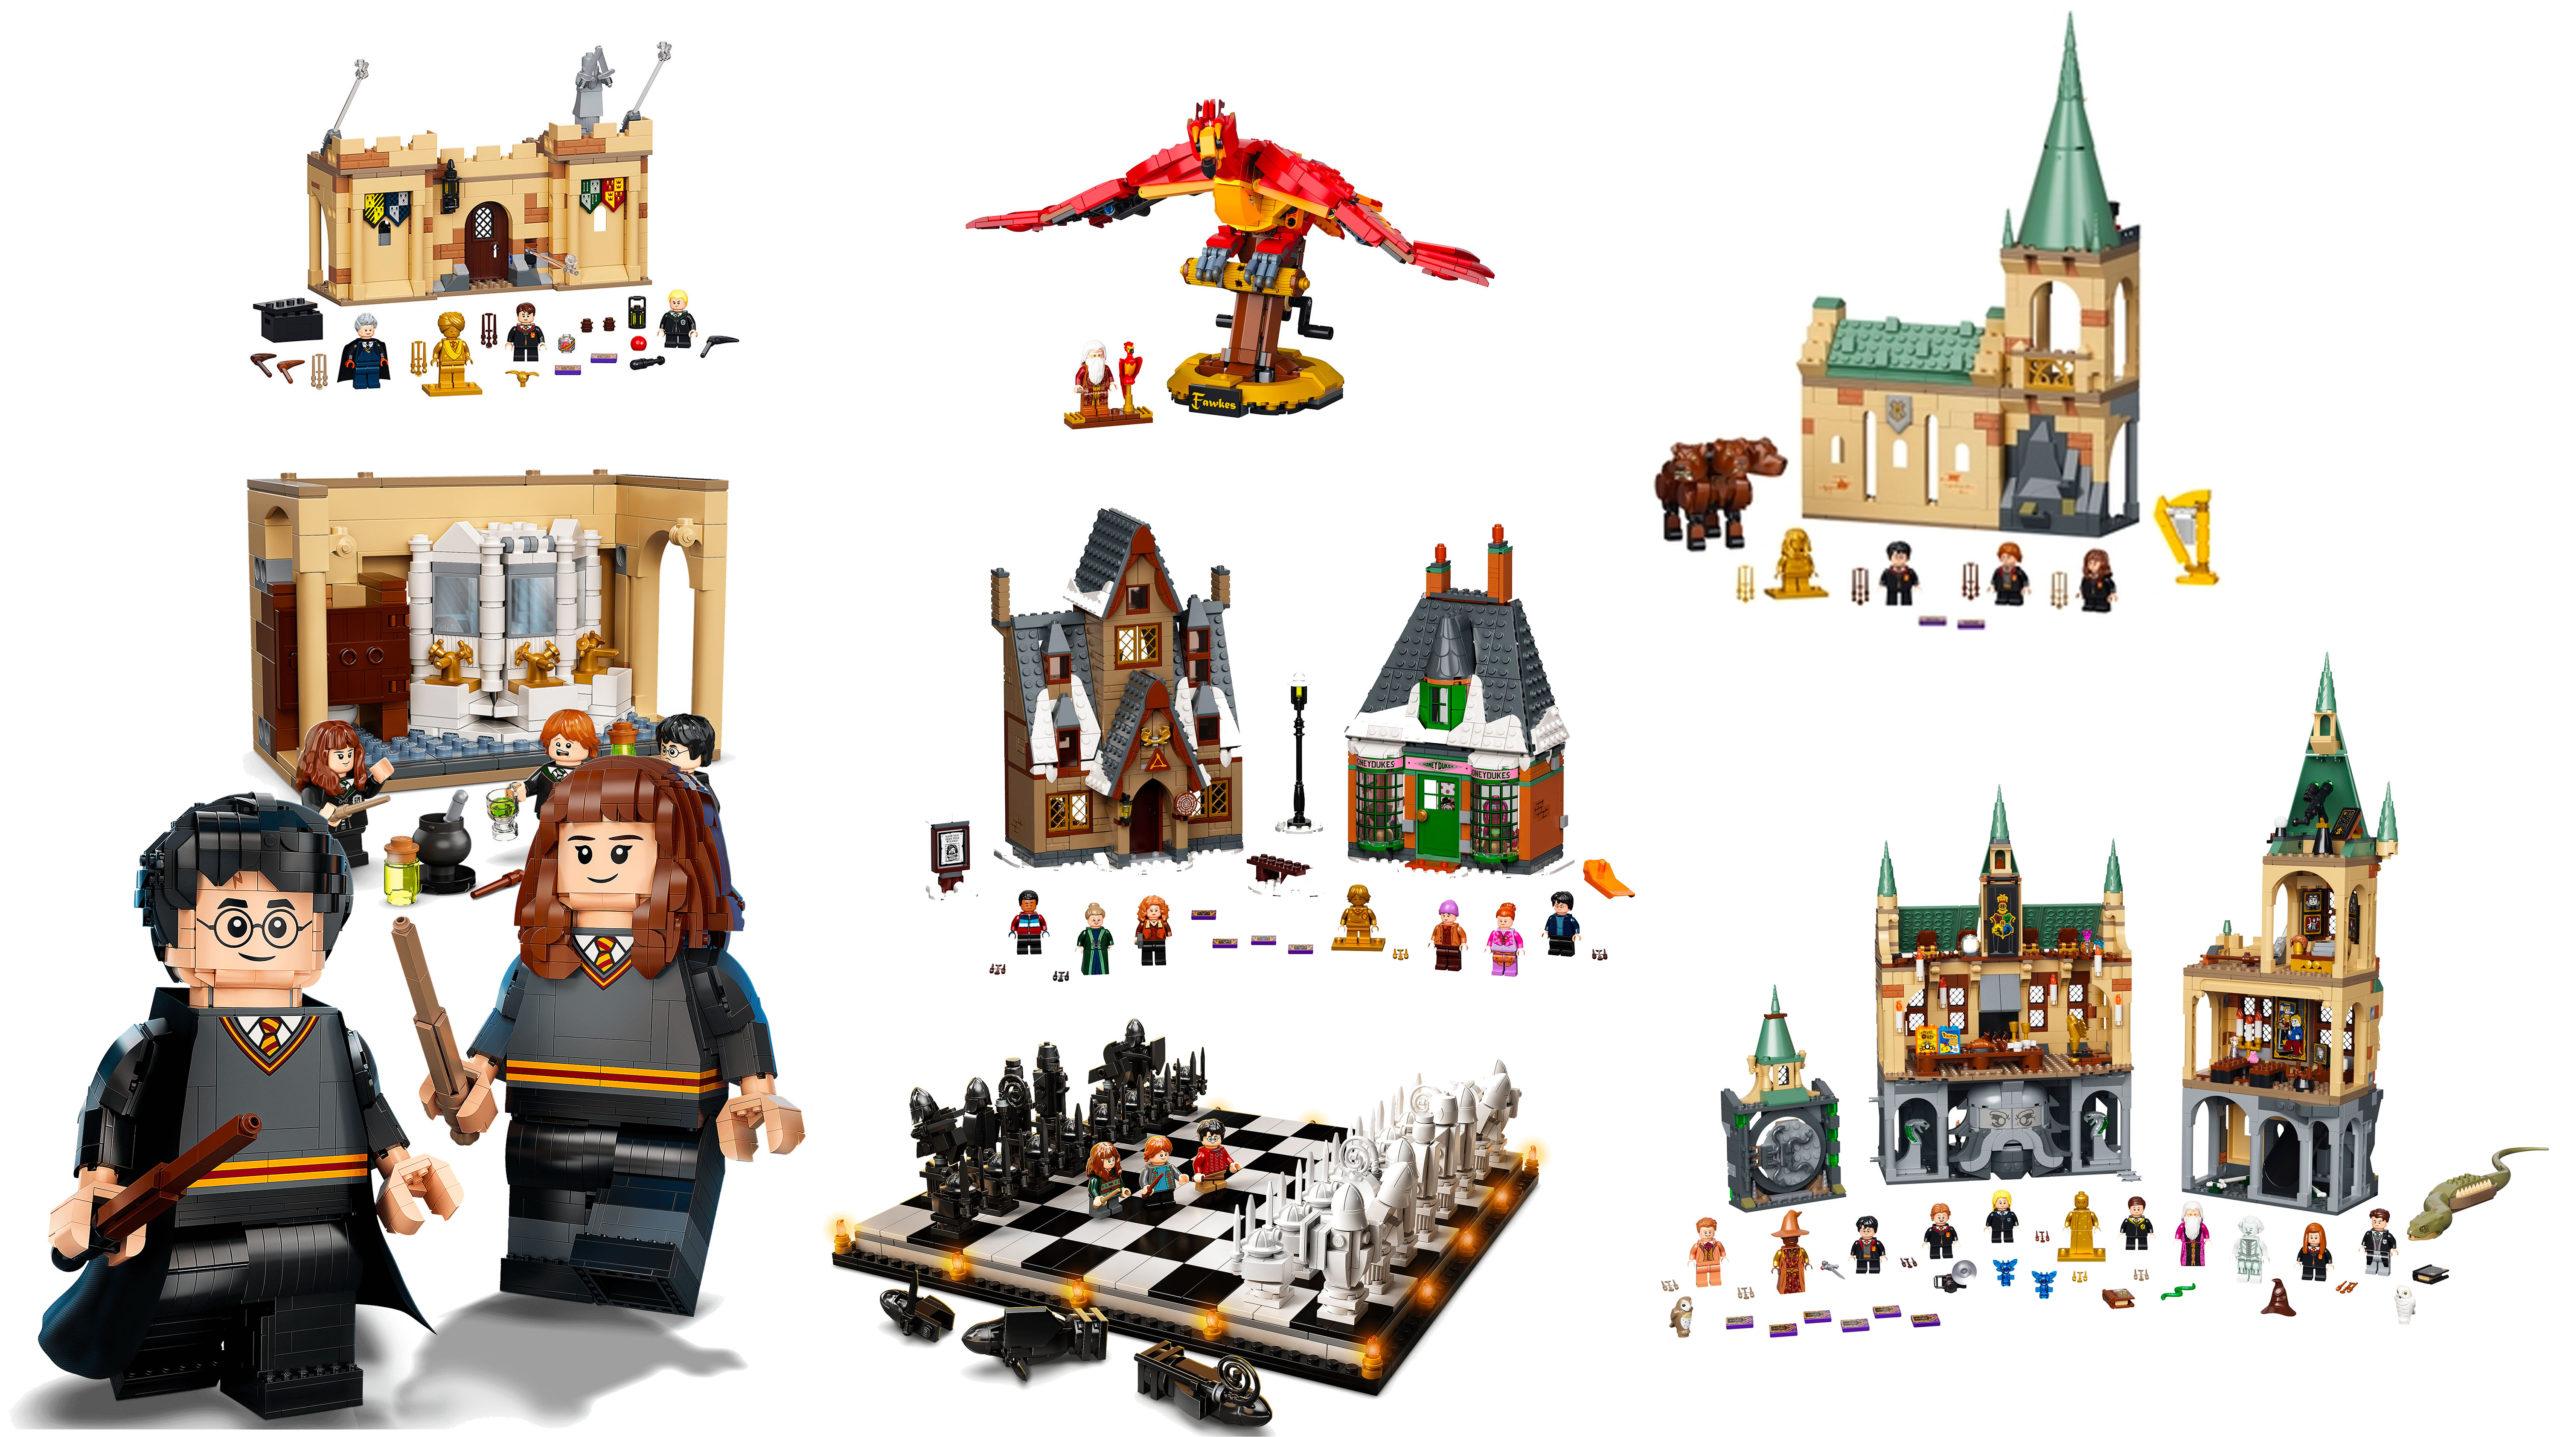 LEGO Harry Potter All Sets